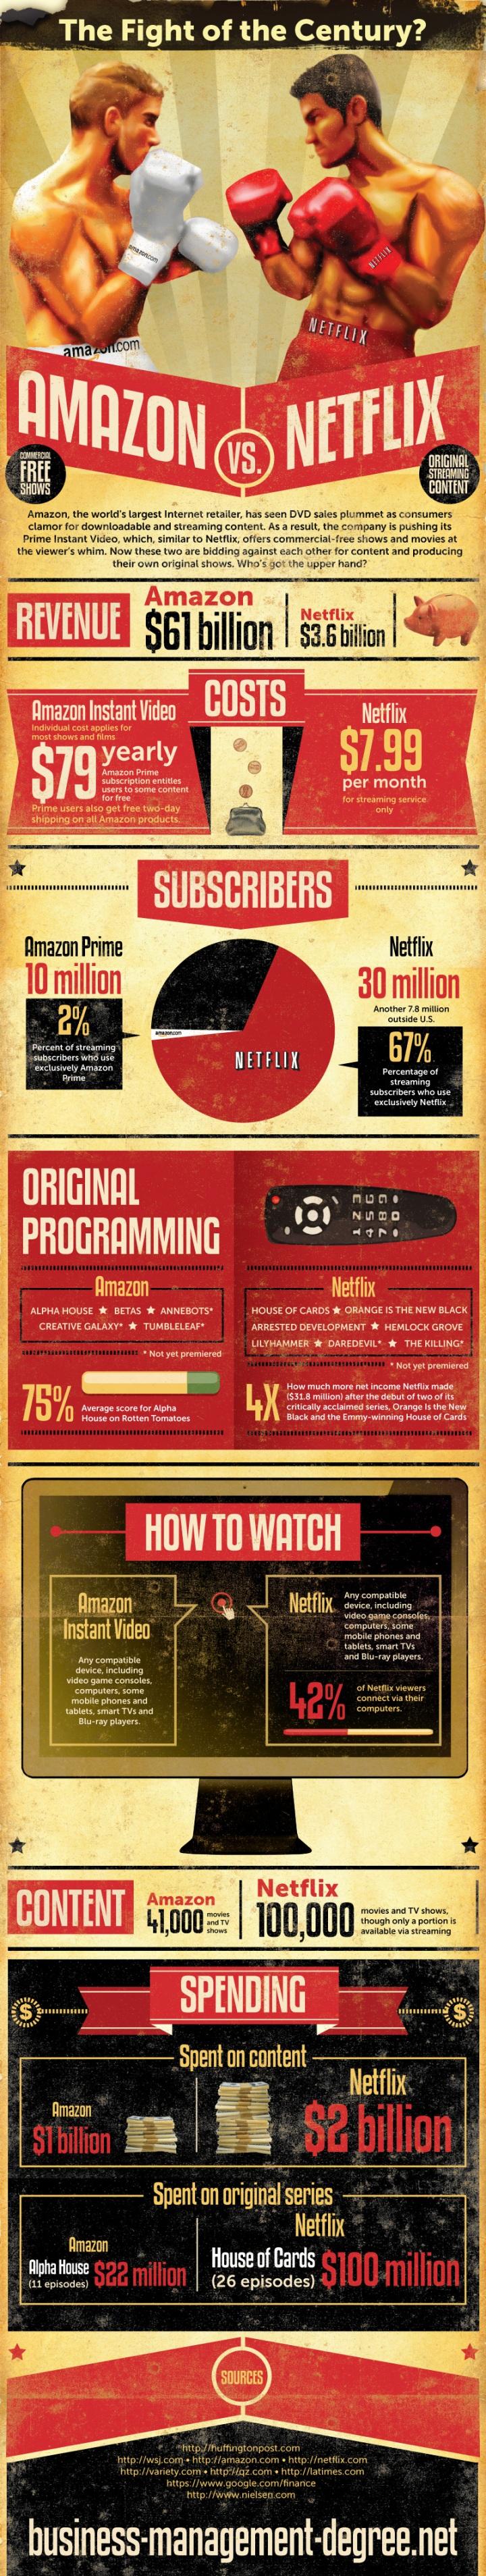 The Fight of the Century: Amazon vs. Netflix